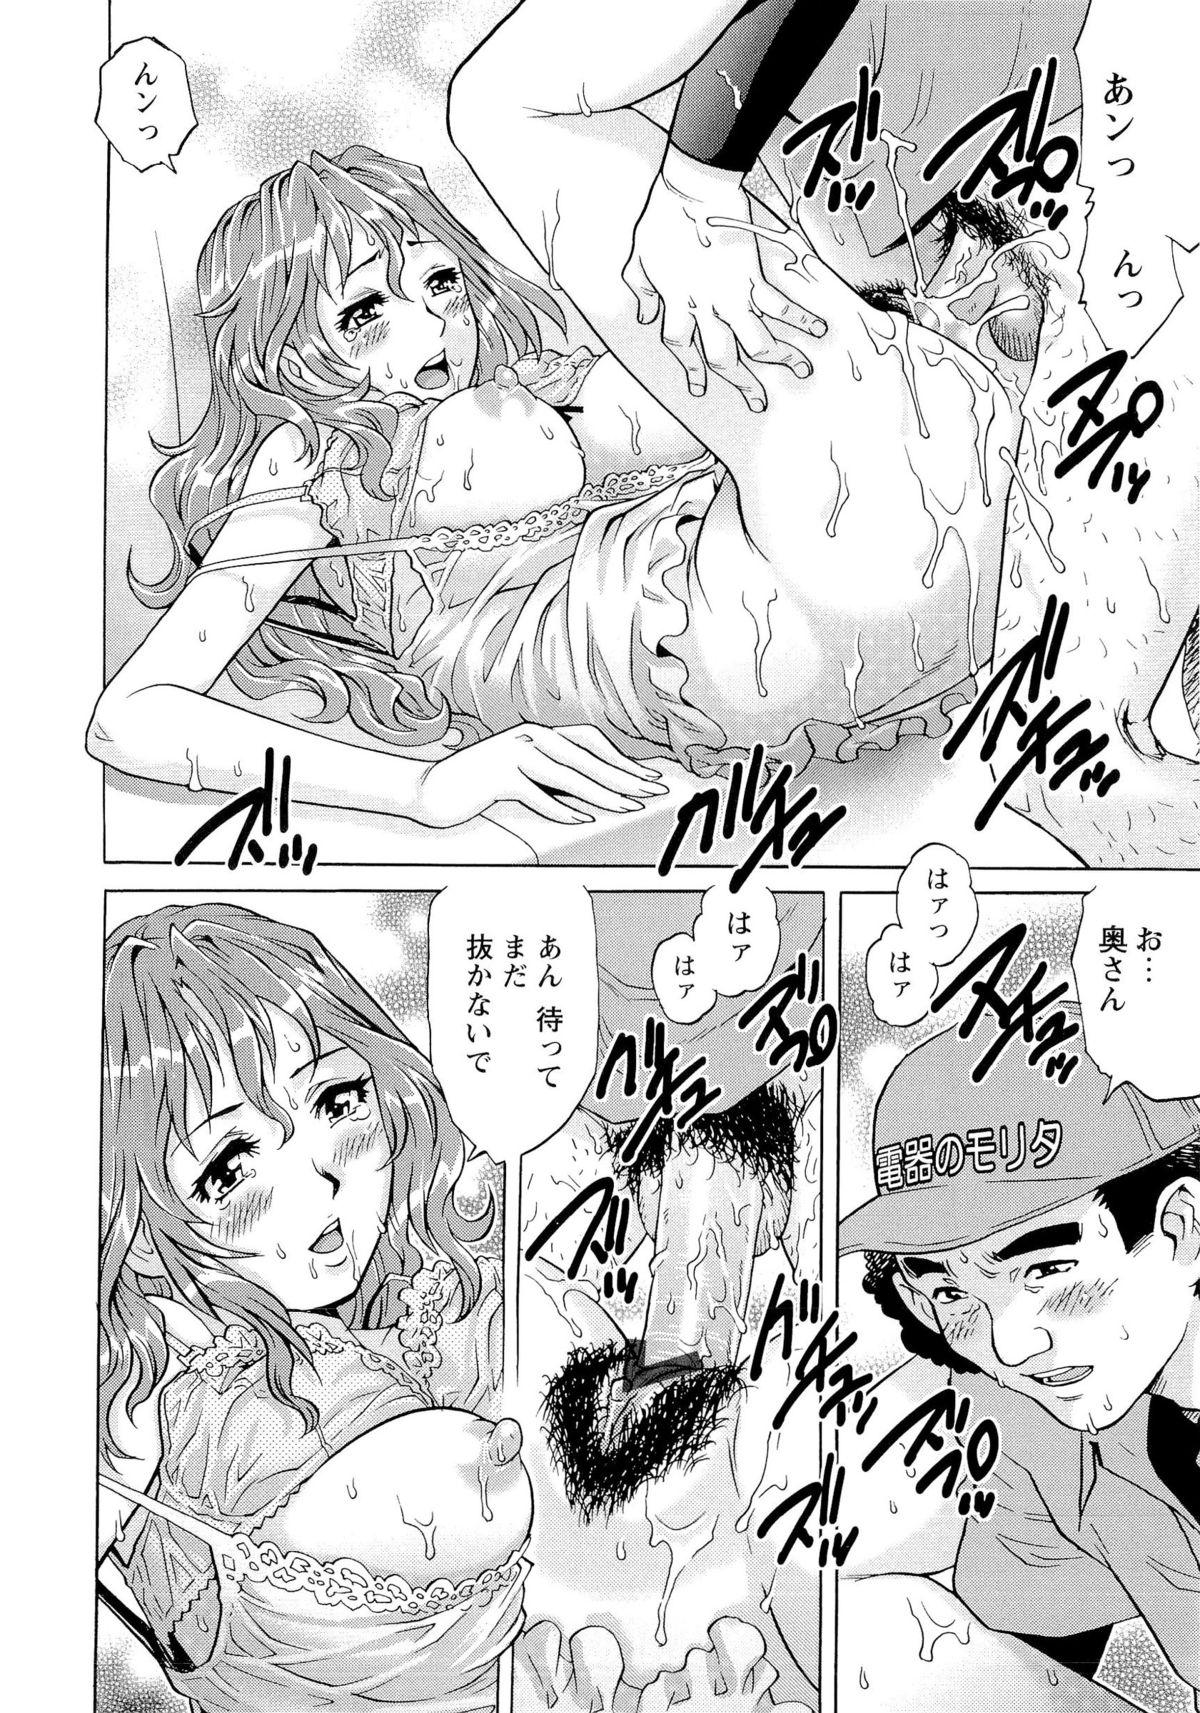 Nureteru Hitozuma - Wetly Wife 112